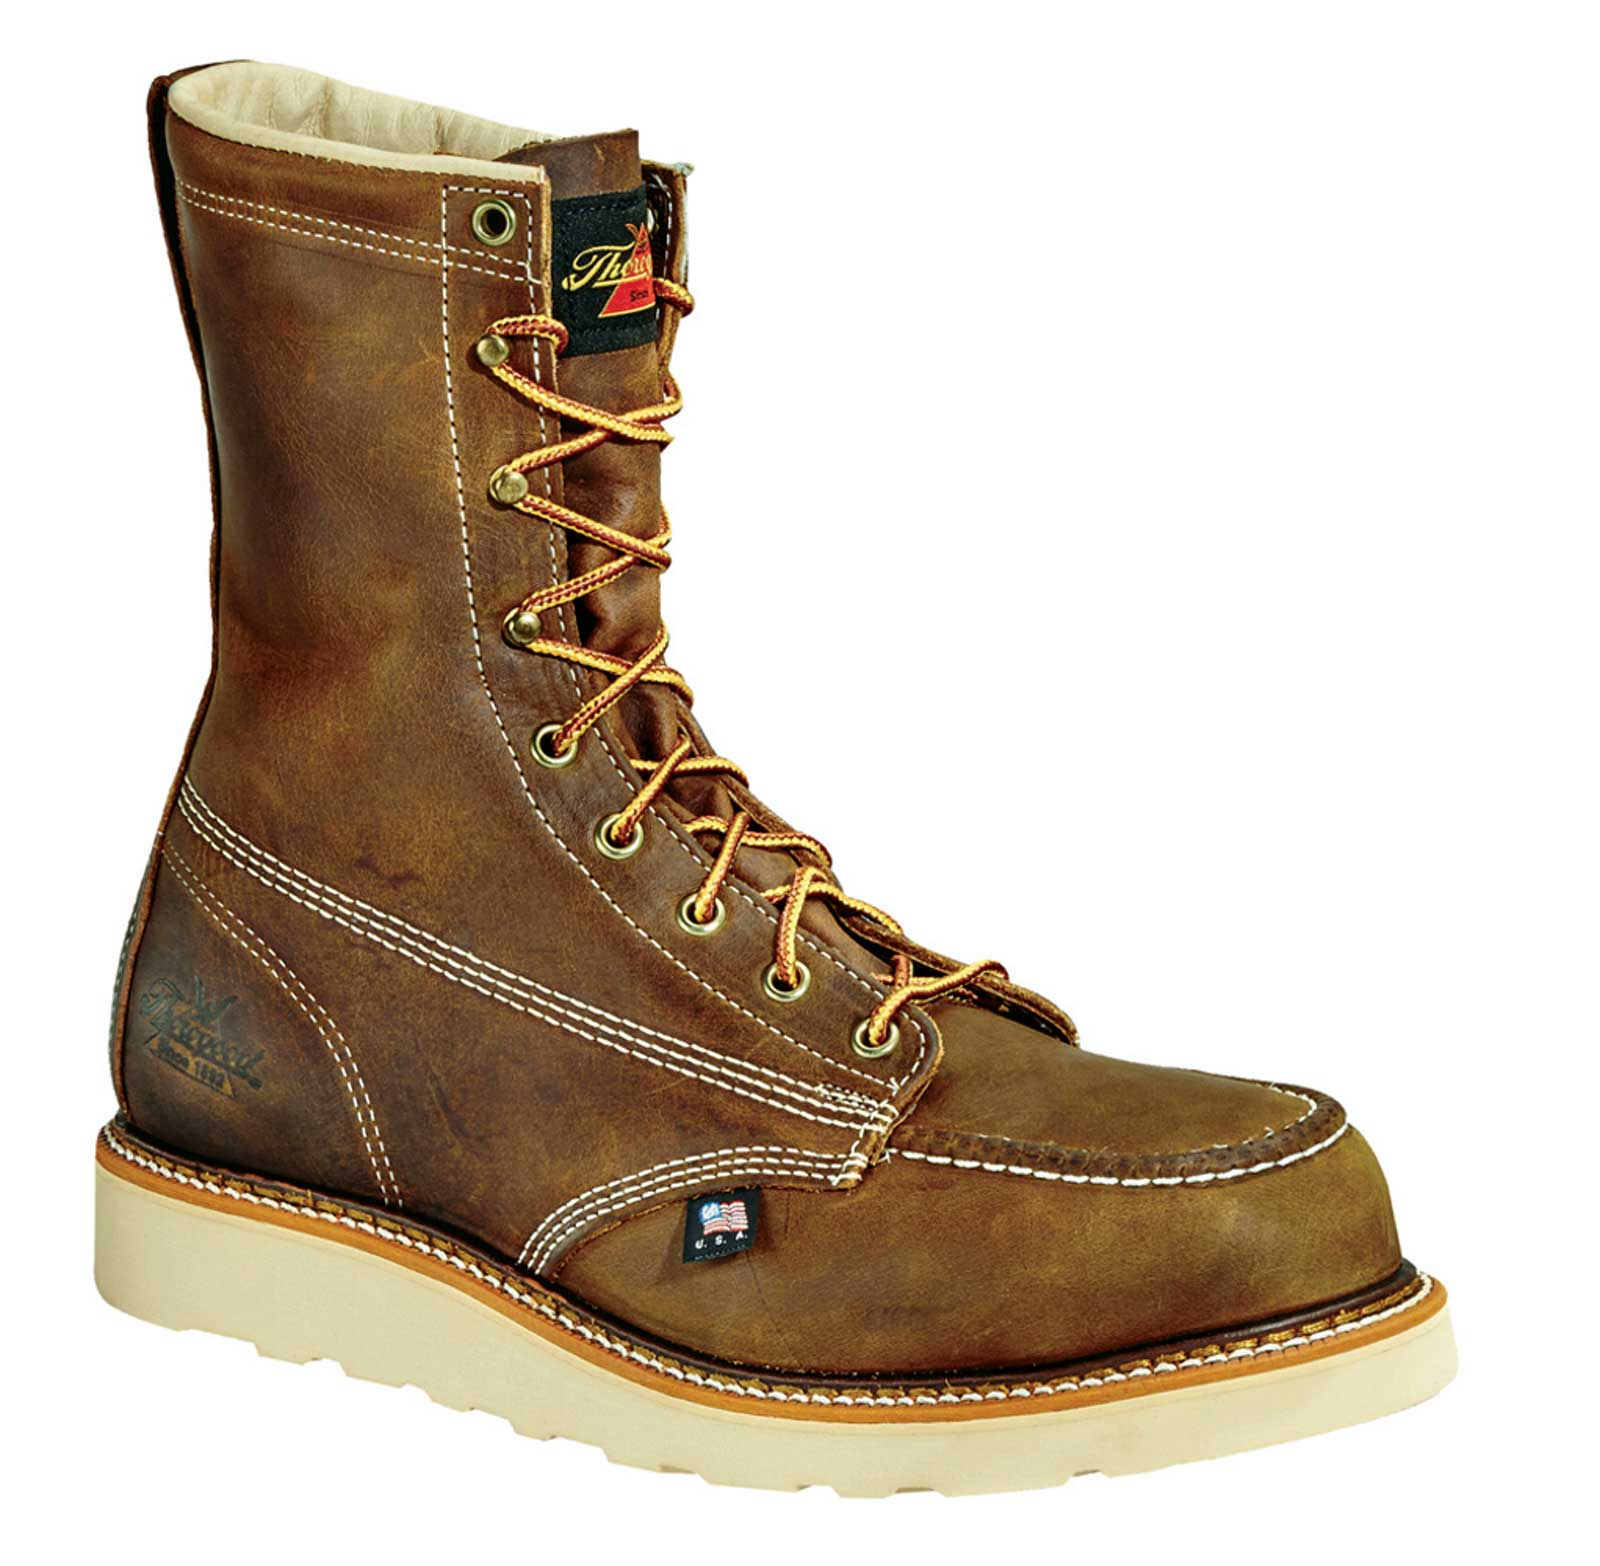 thorogood 8 quot steel toe wedge sole work boot u s a made